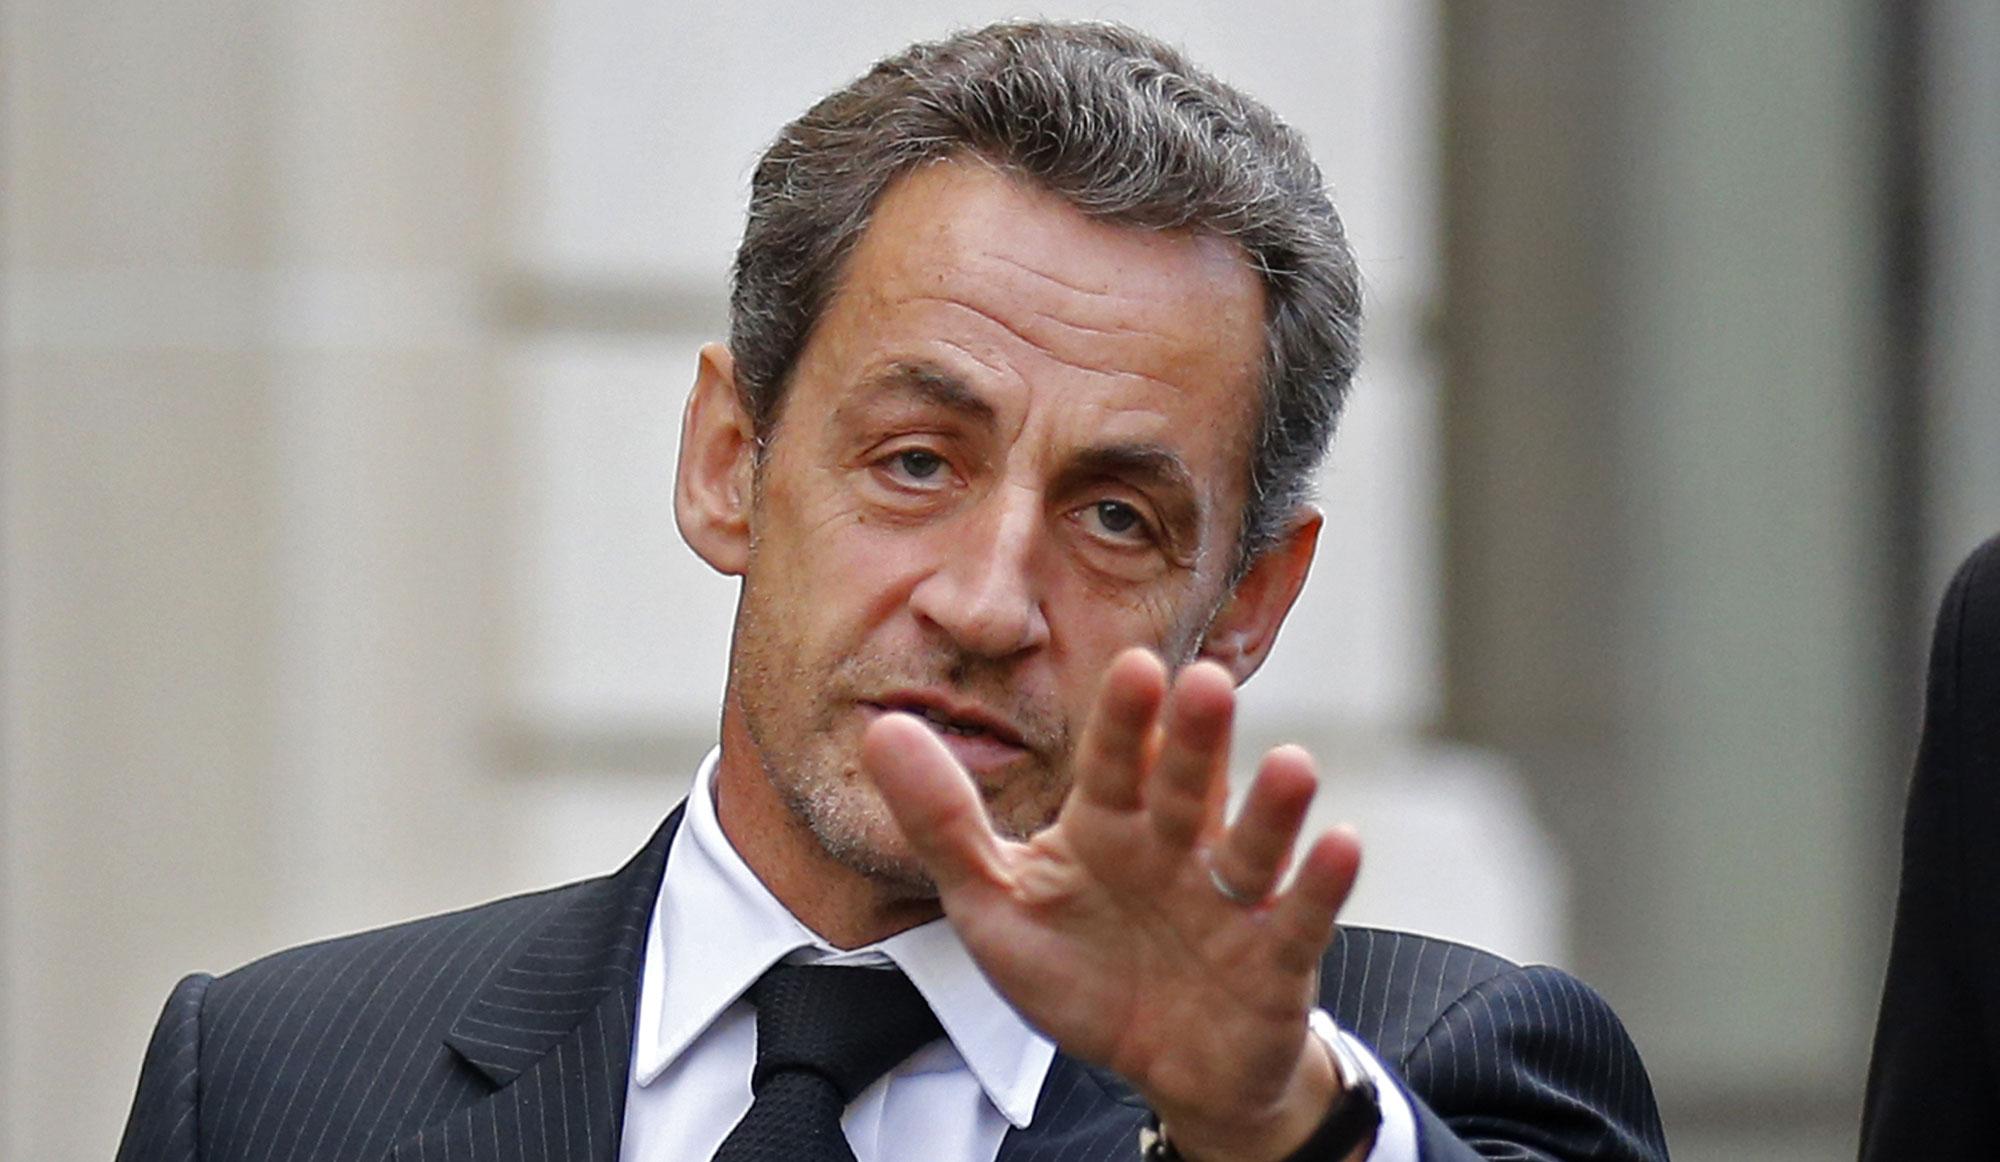 Sarkozy en visite en Israel échoue sur la franchise